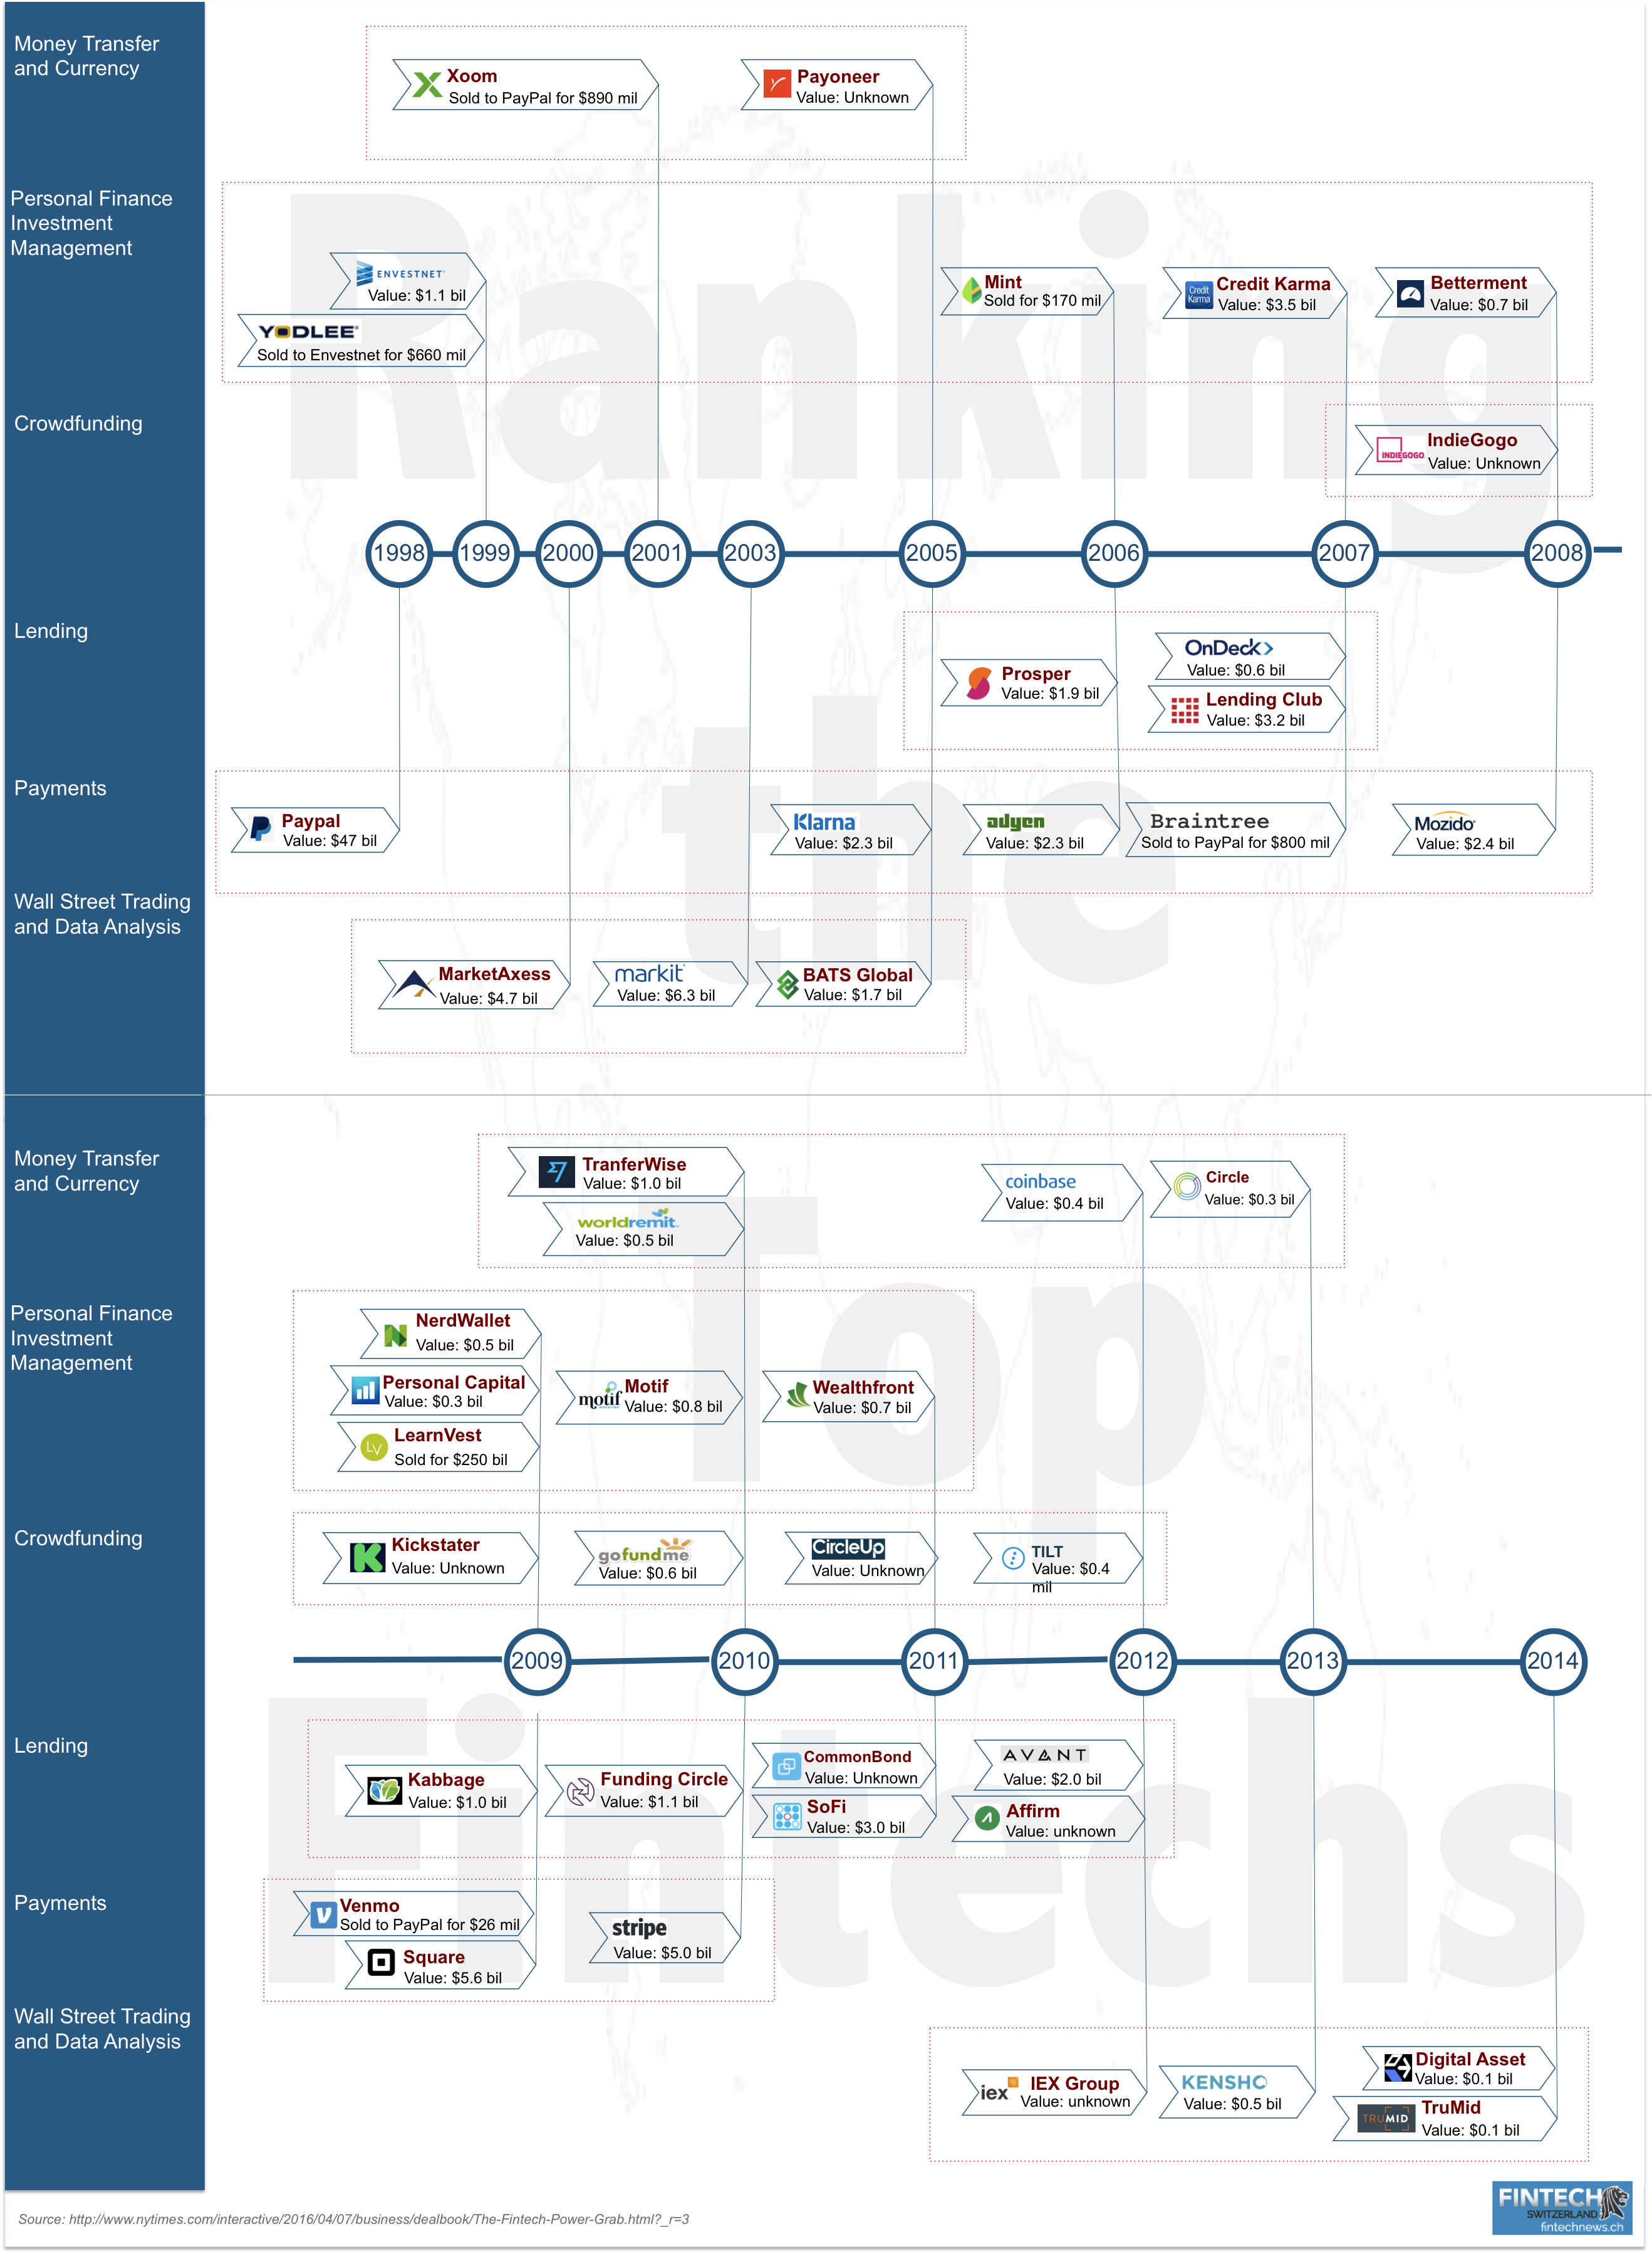 Ranking The Top Fintech Companies | Design: Fintech in 2019